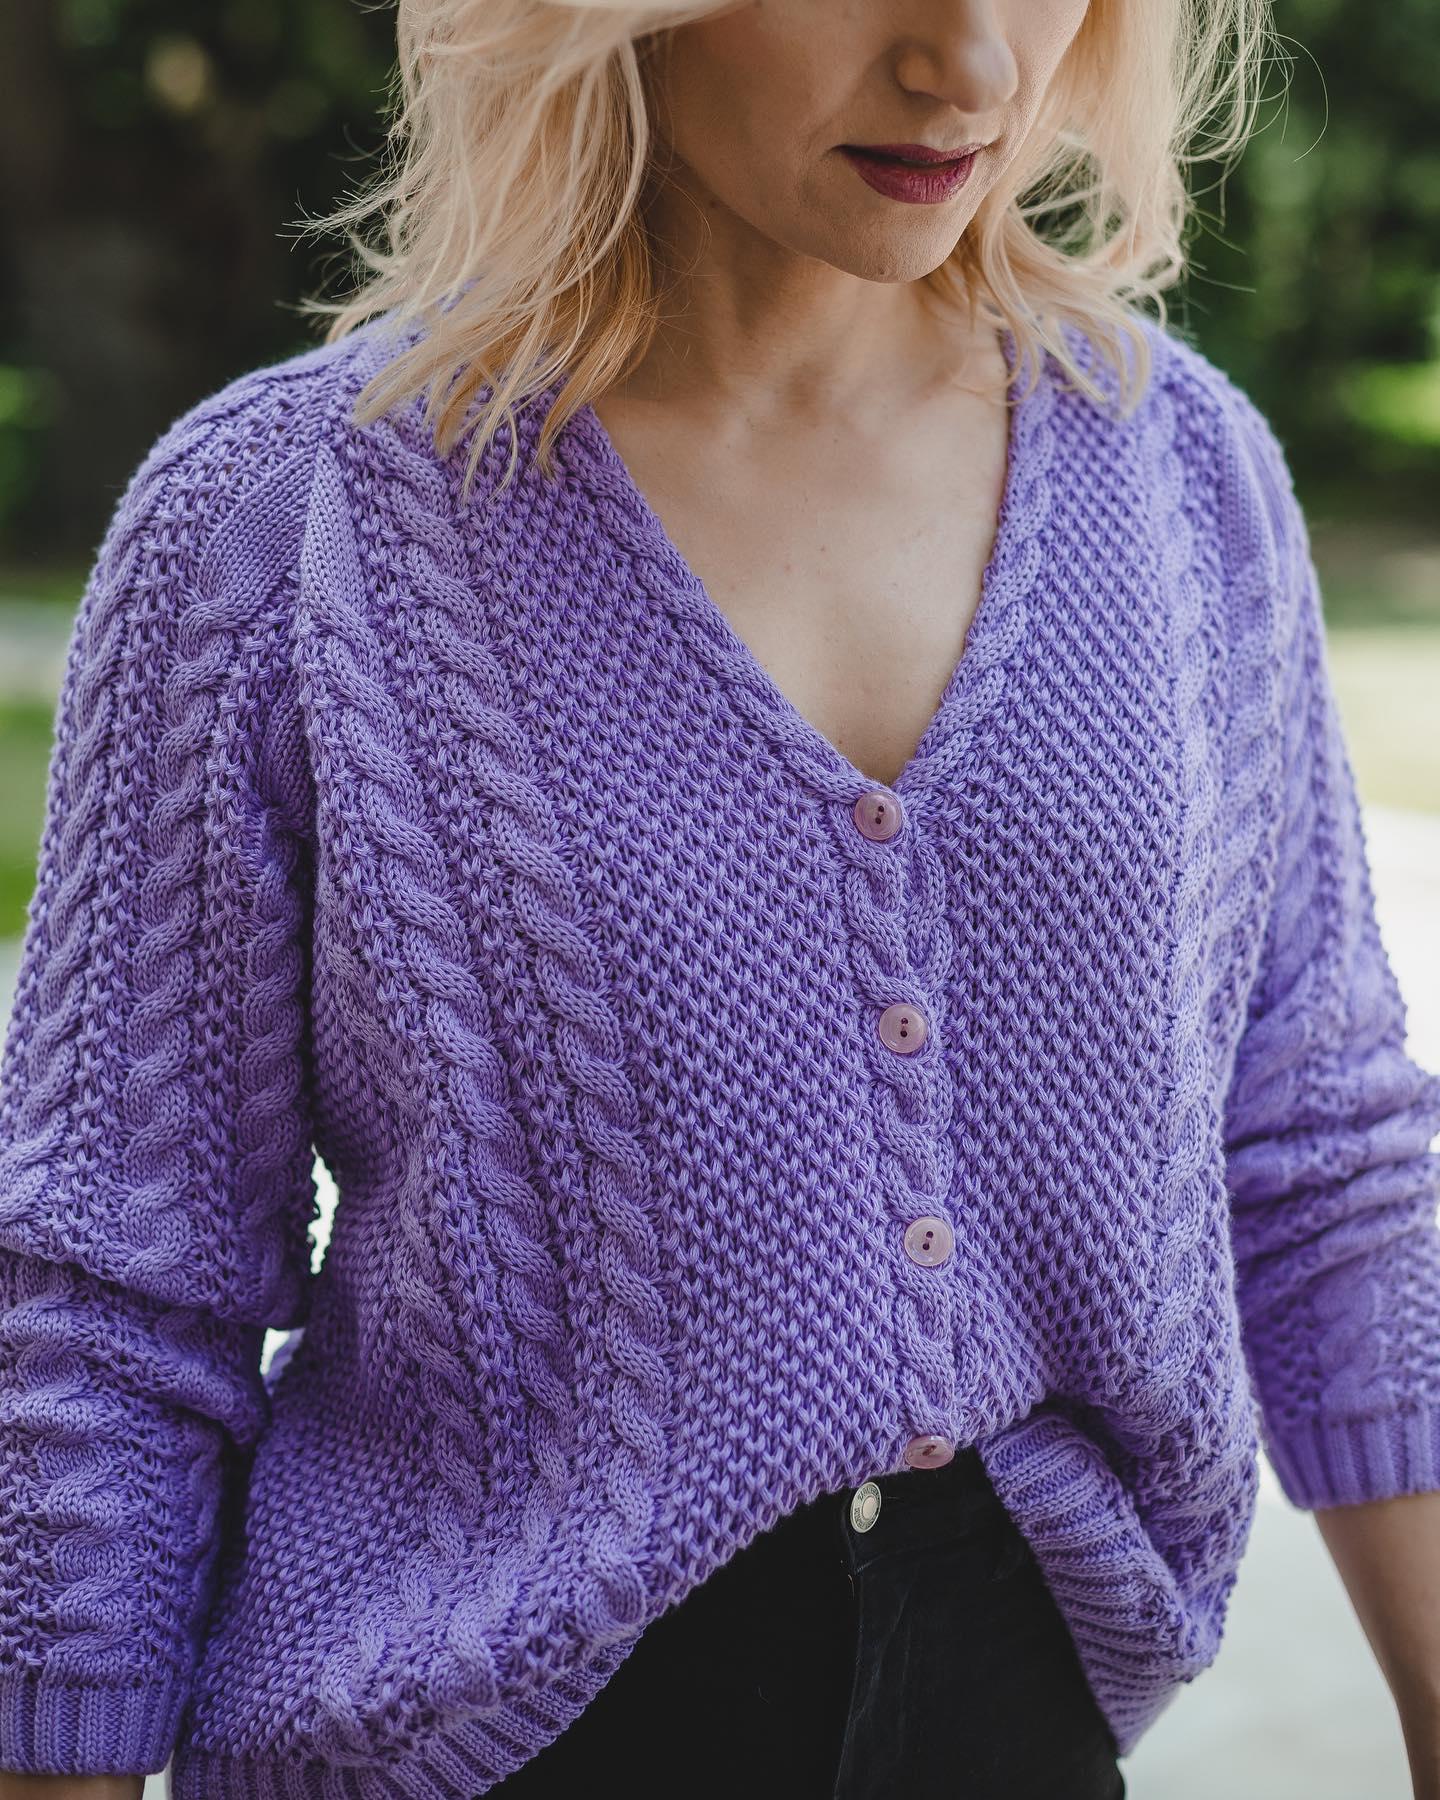 Lawendowe dzień dobry 💜💜💜 #BienkovskaLavender #cotton #knit